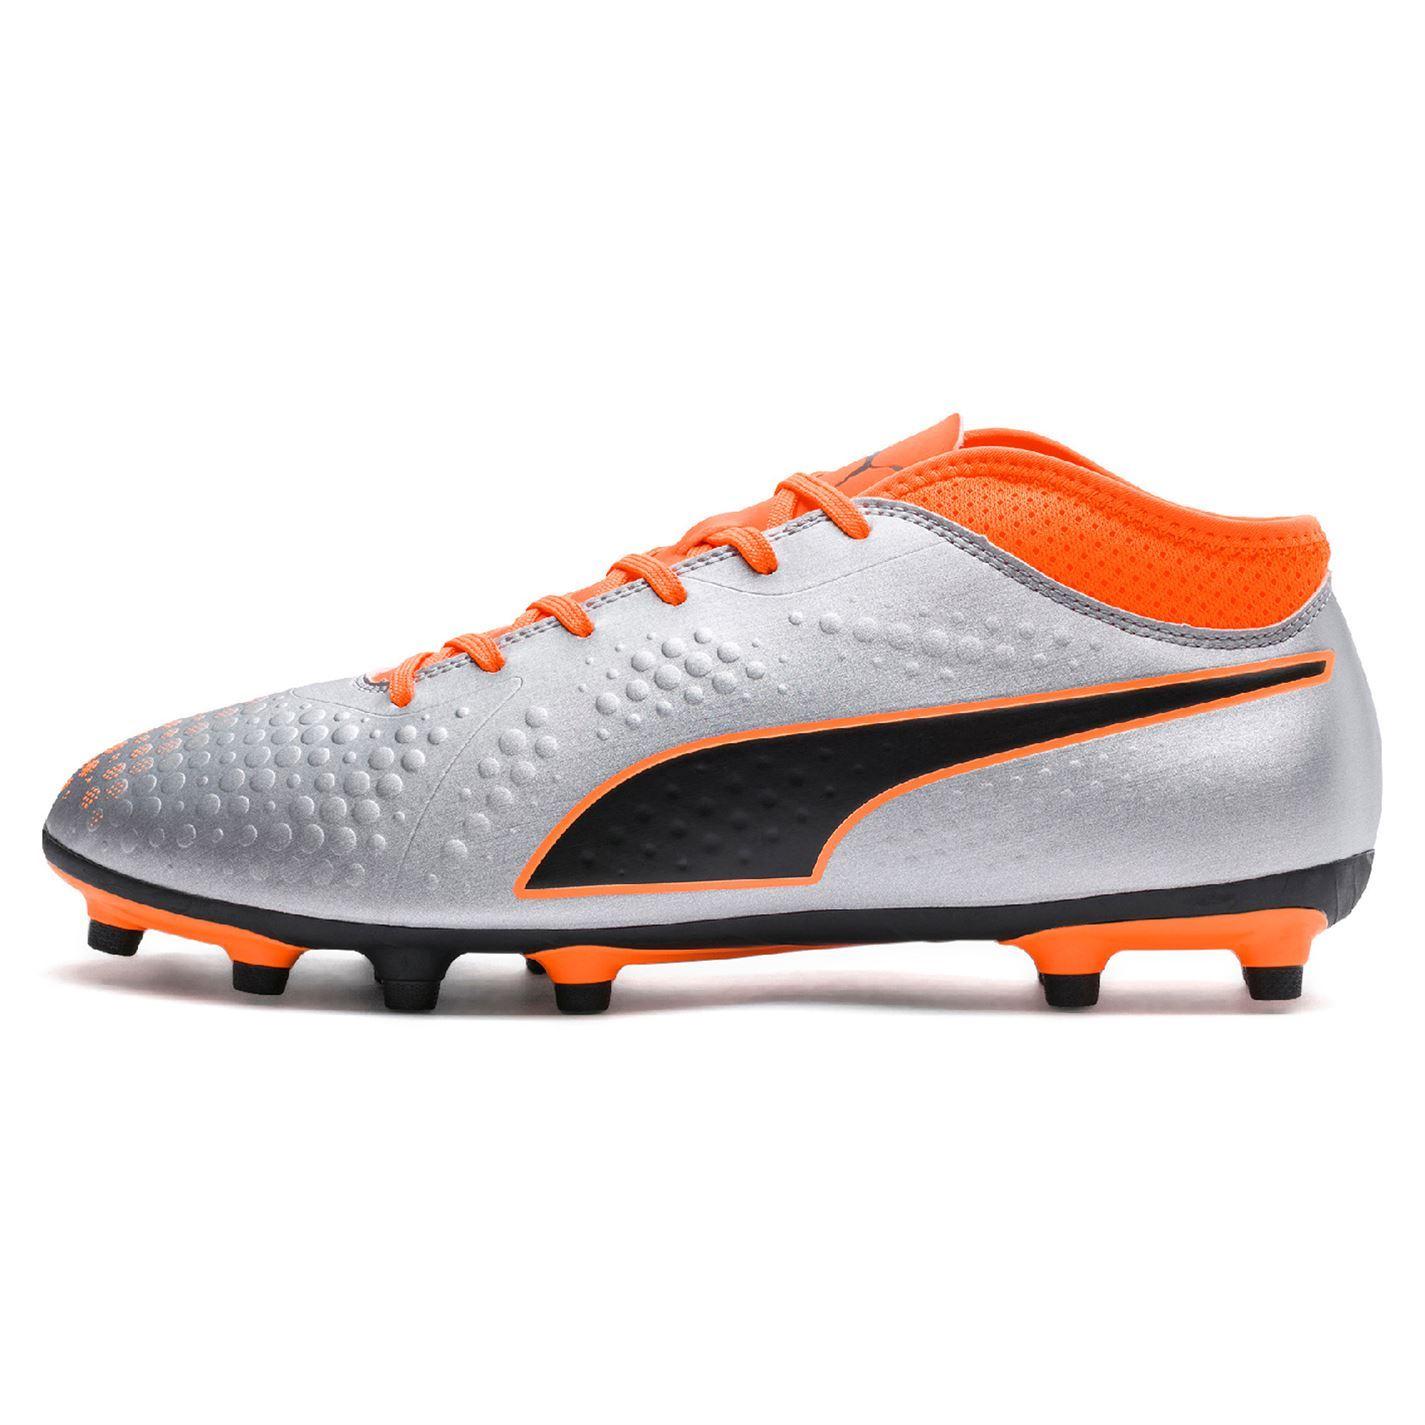 miniature 4 - Puma 4 FG Firm Ground Chaussures De Football Homme Football Chaussures Crampons